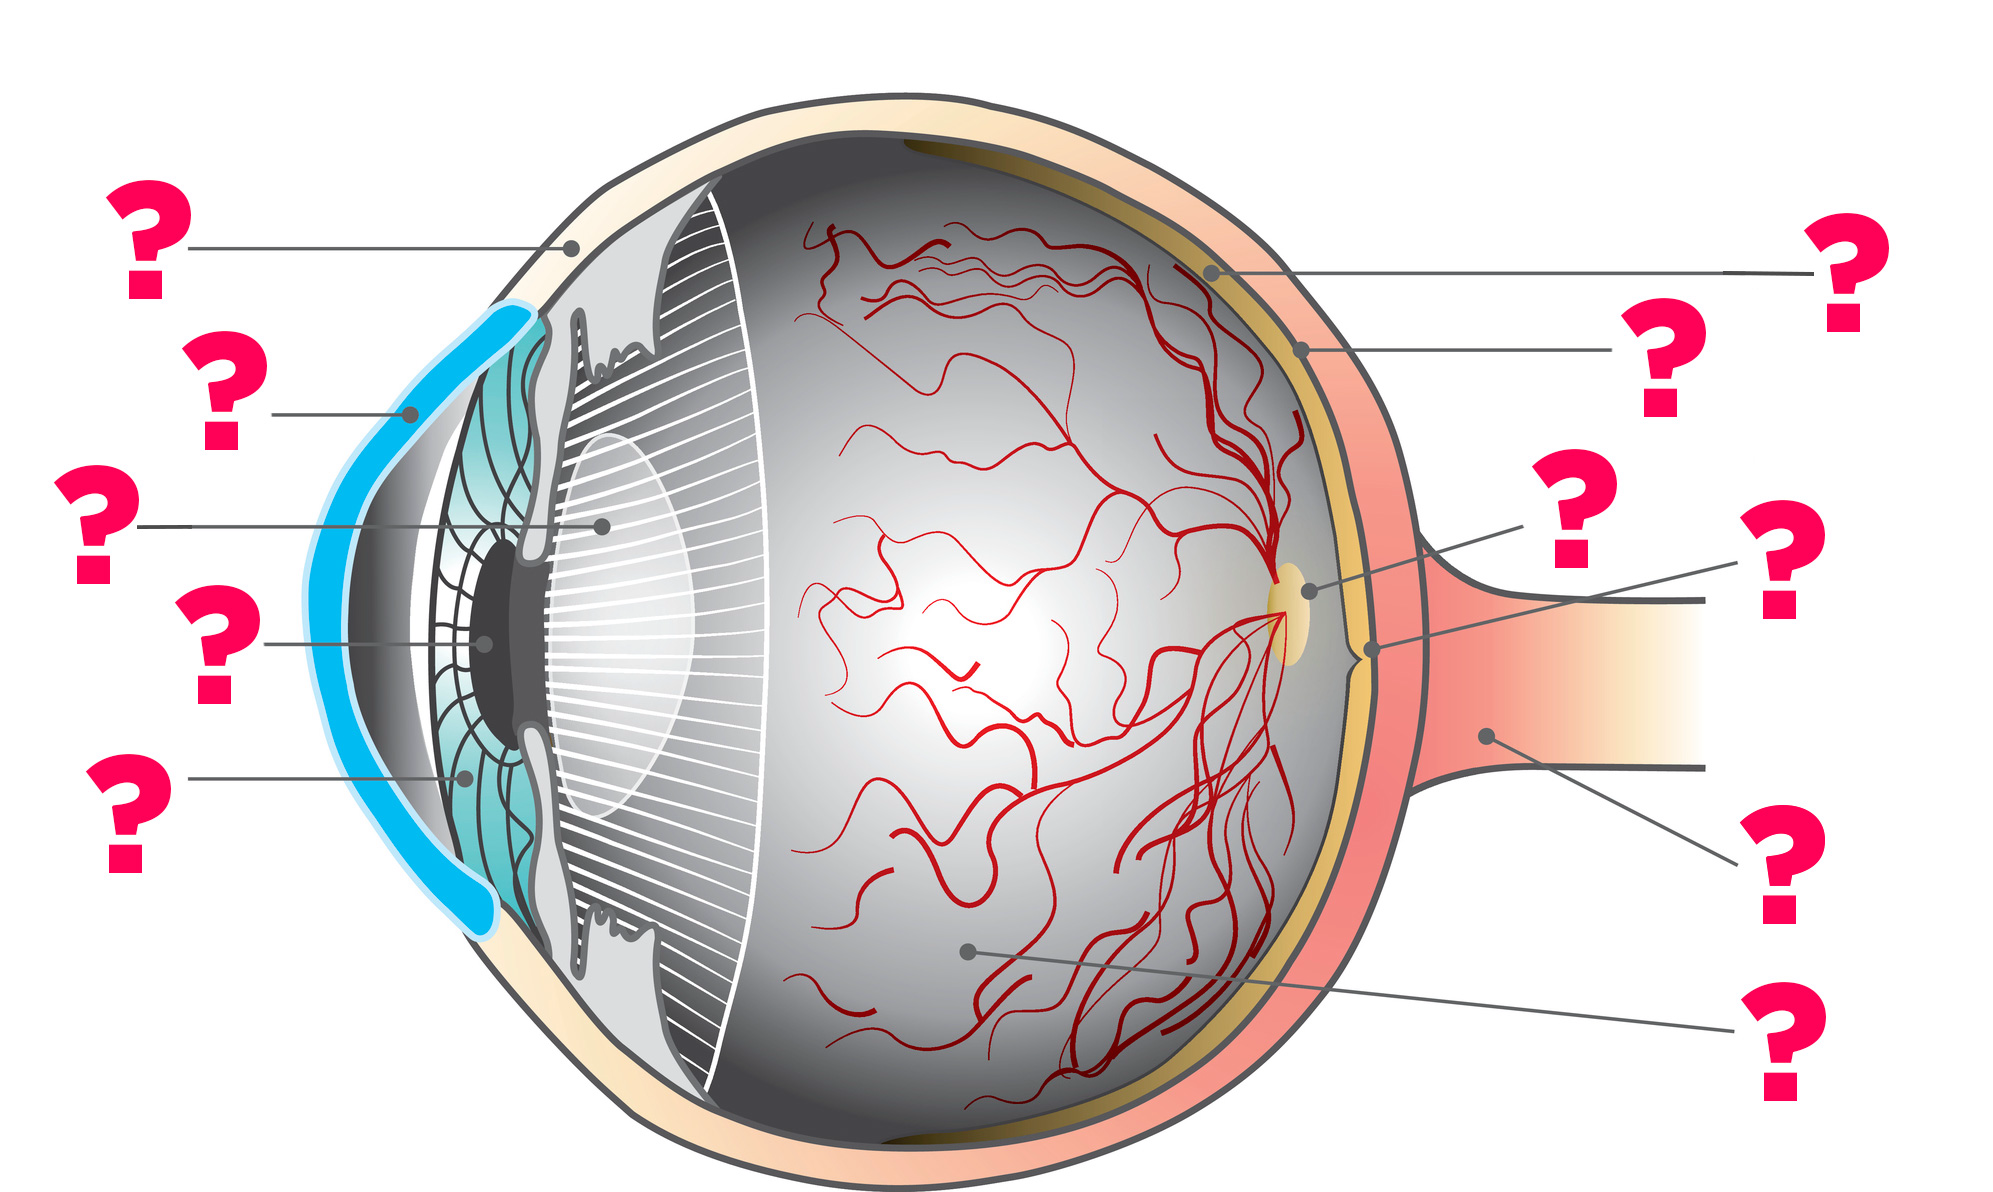 eye diagram for quiz wiring diagram read Eye Diagram Coloring Page eye diagram quiz game ngs wiring diagram cerebral cortex diagram quiz can you get 11 11